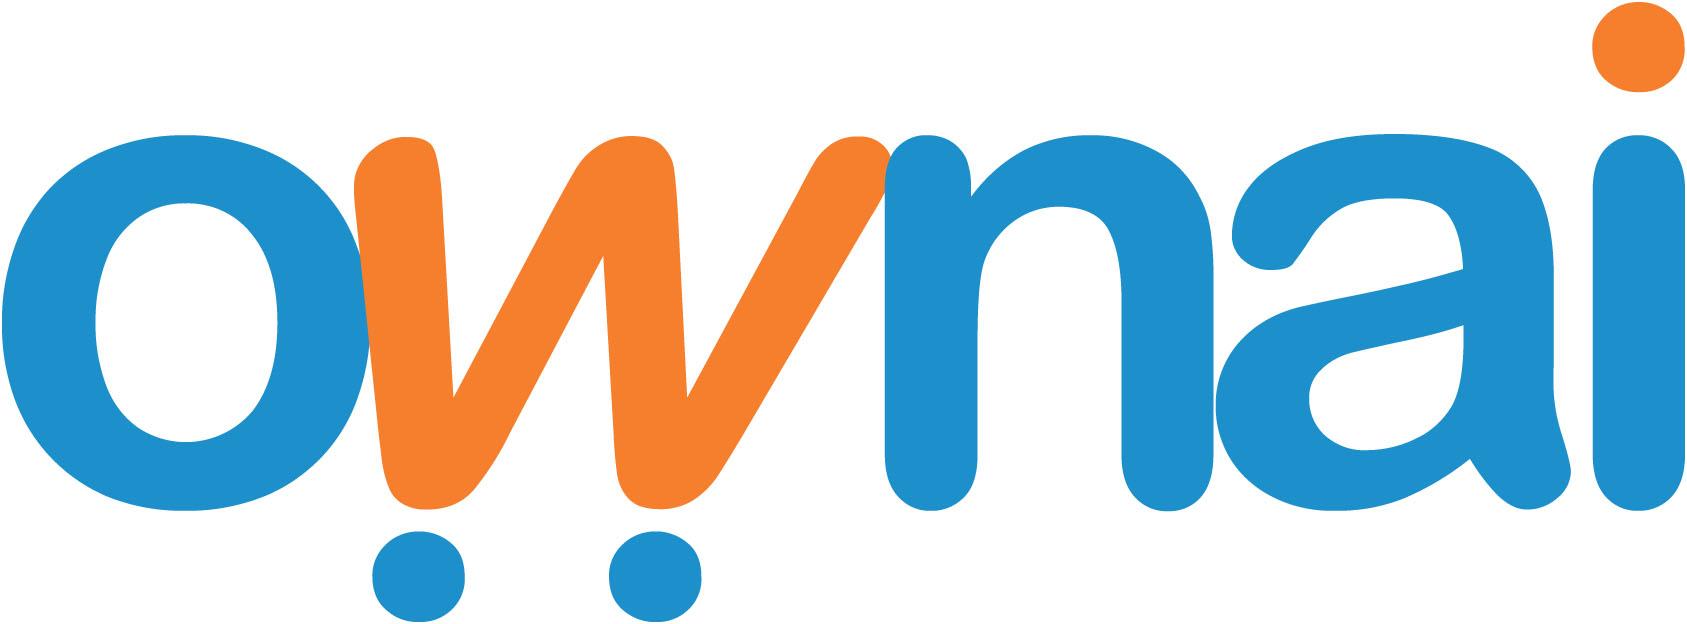 ownai-logo